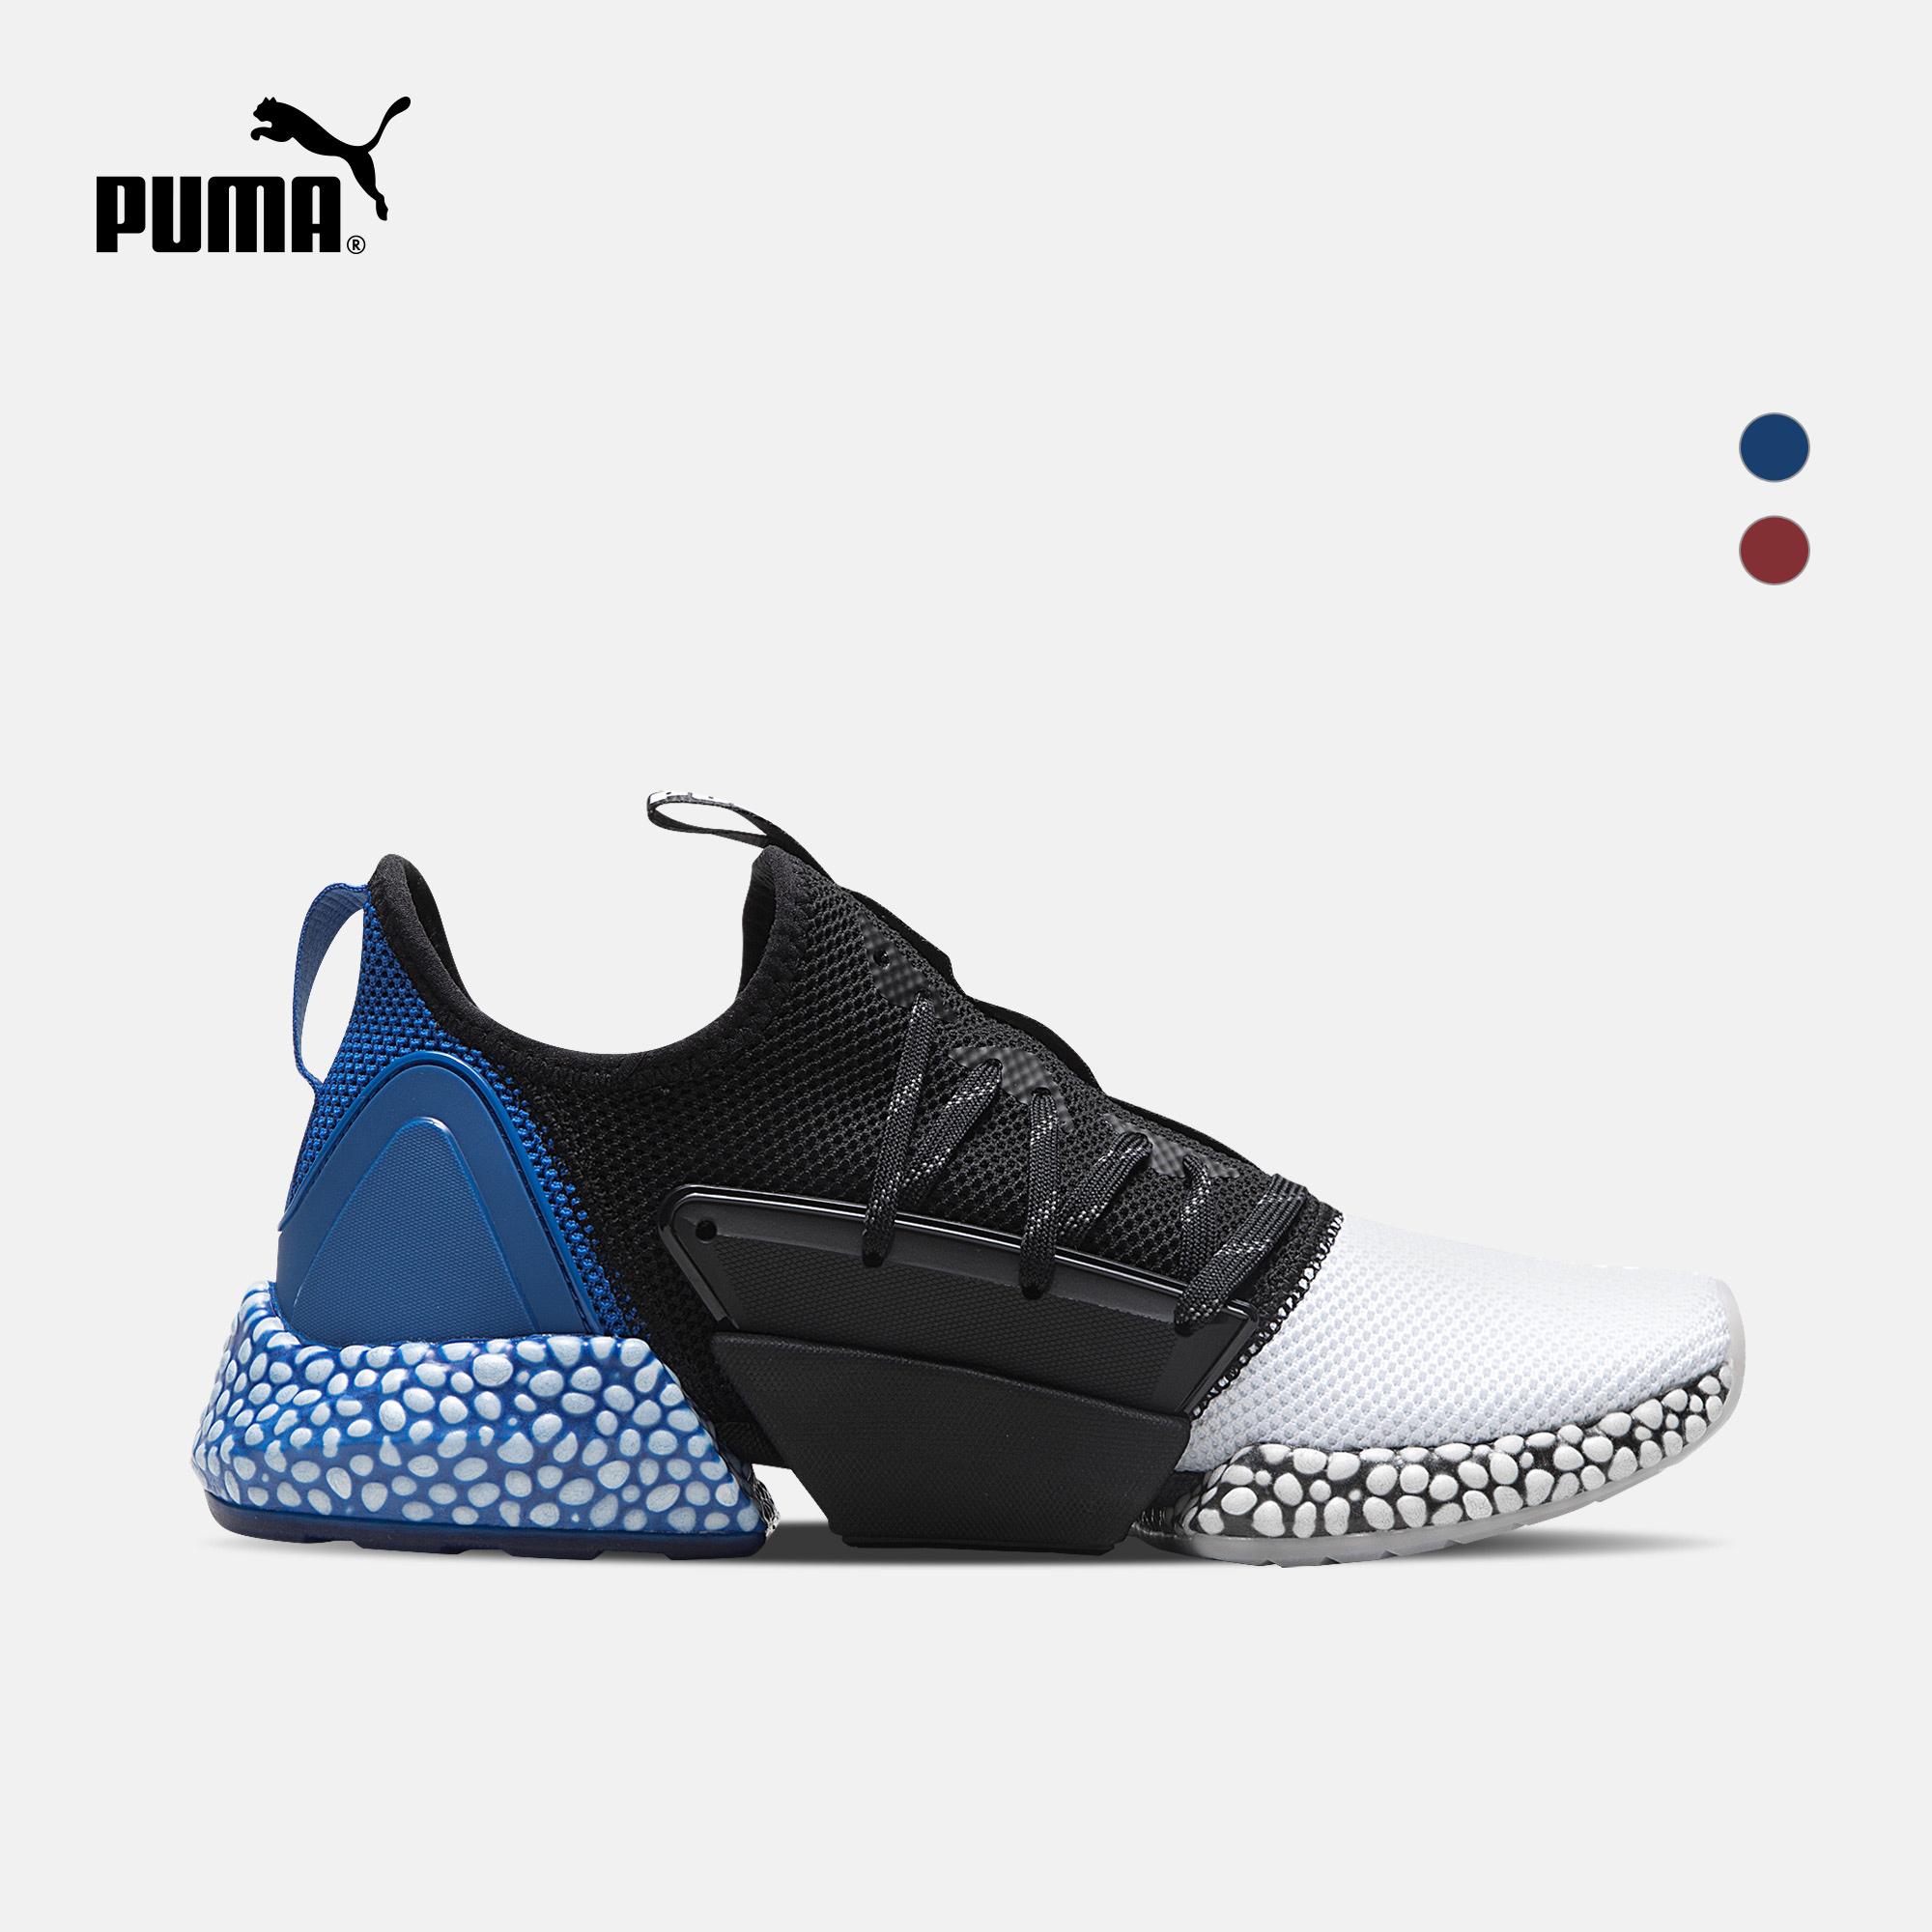 2bc665c565f USD 288.49  PUMA Puma Official men s Running shoes Hybrid Rocket ...